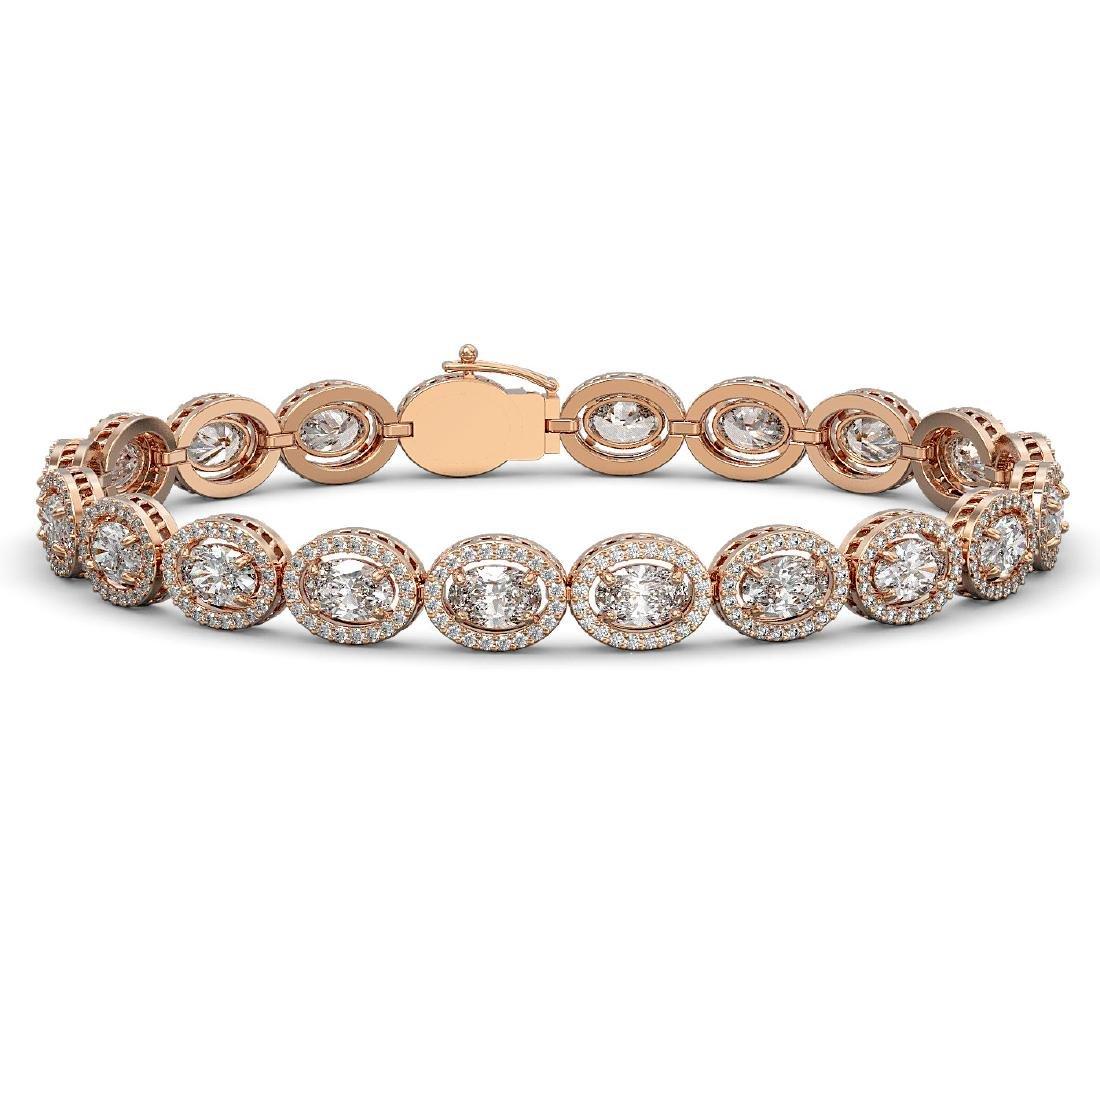 15.20 CTW Oval Diamond Designer Bracelet 18K Rose Gold